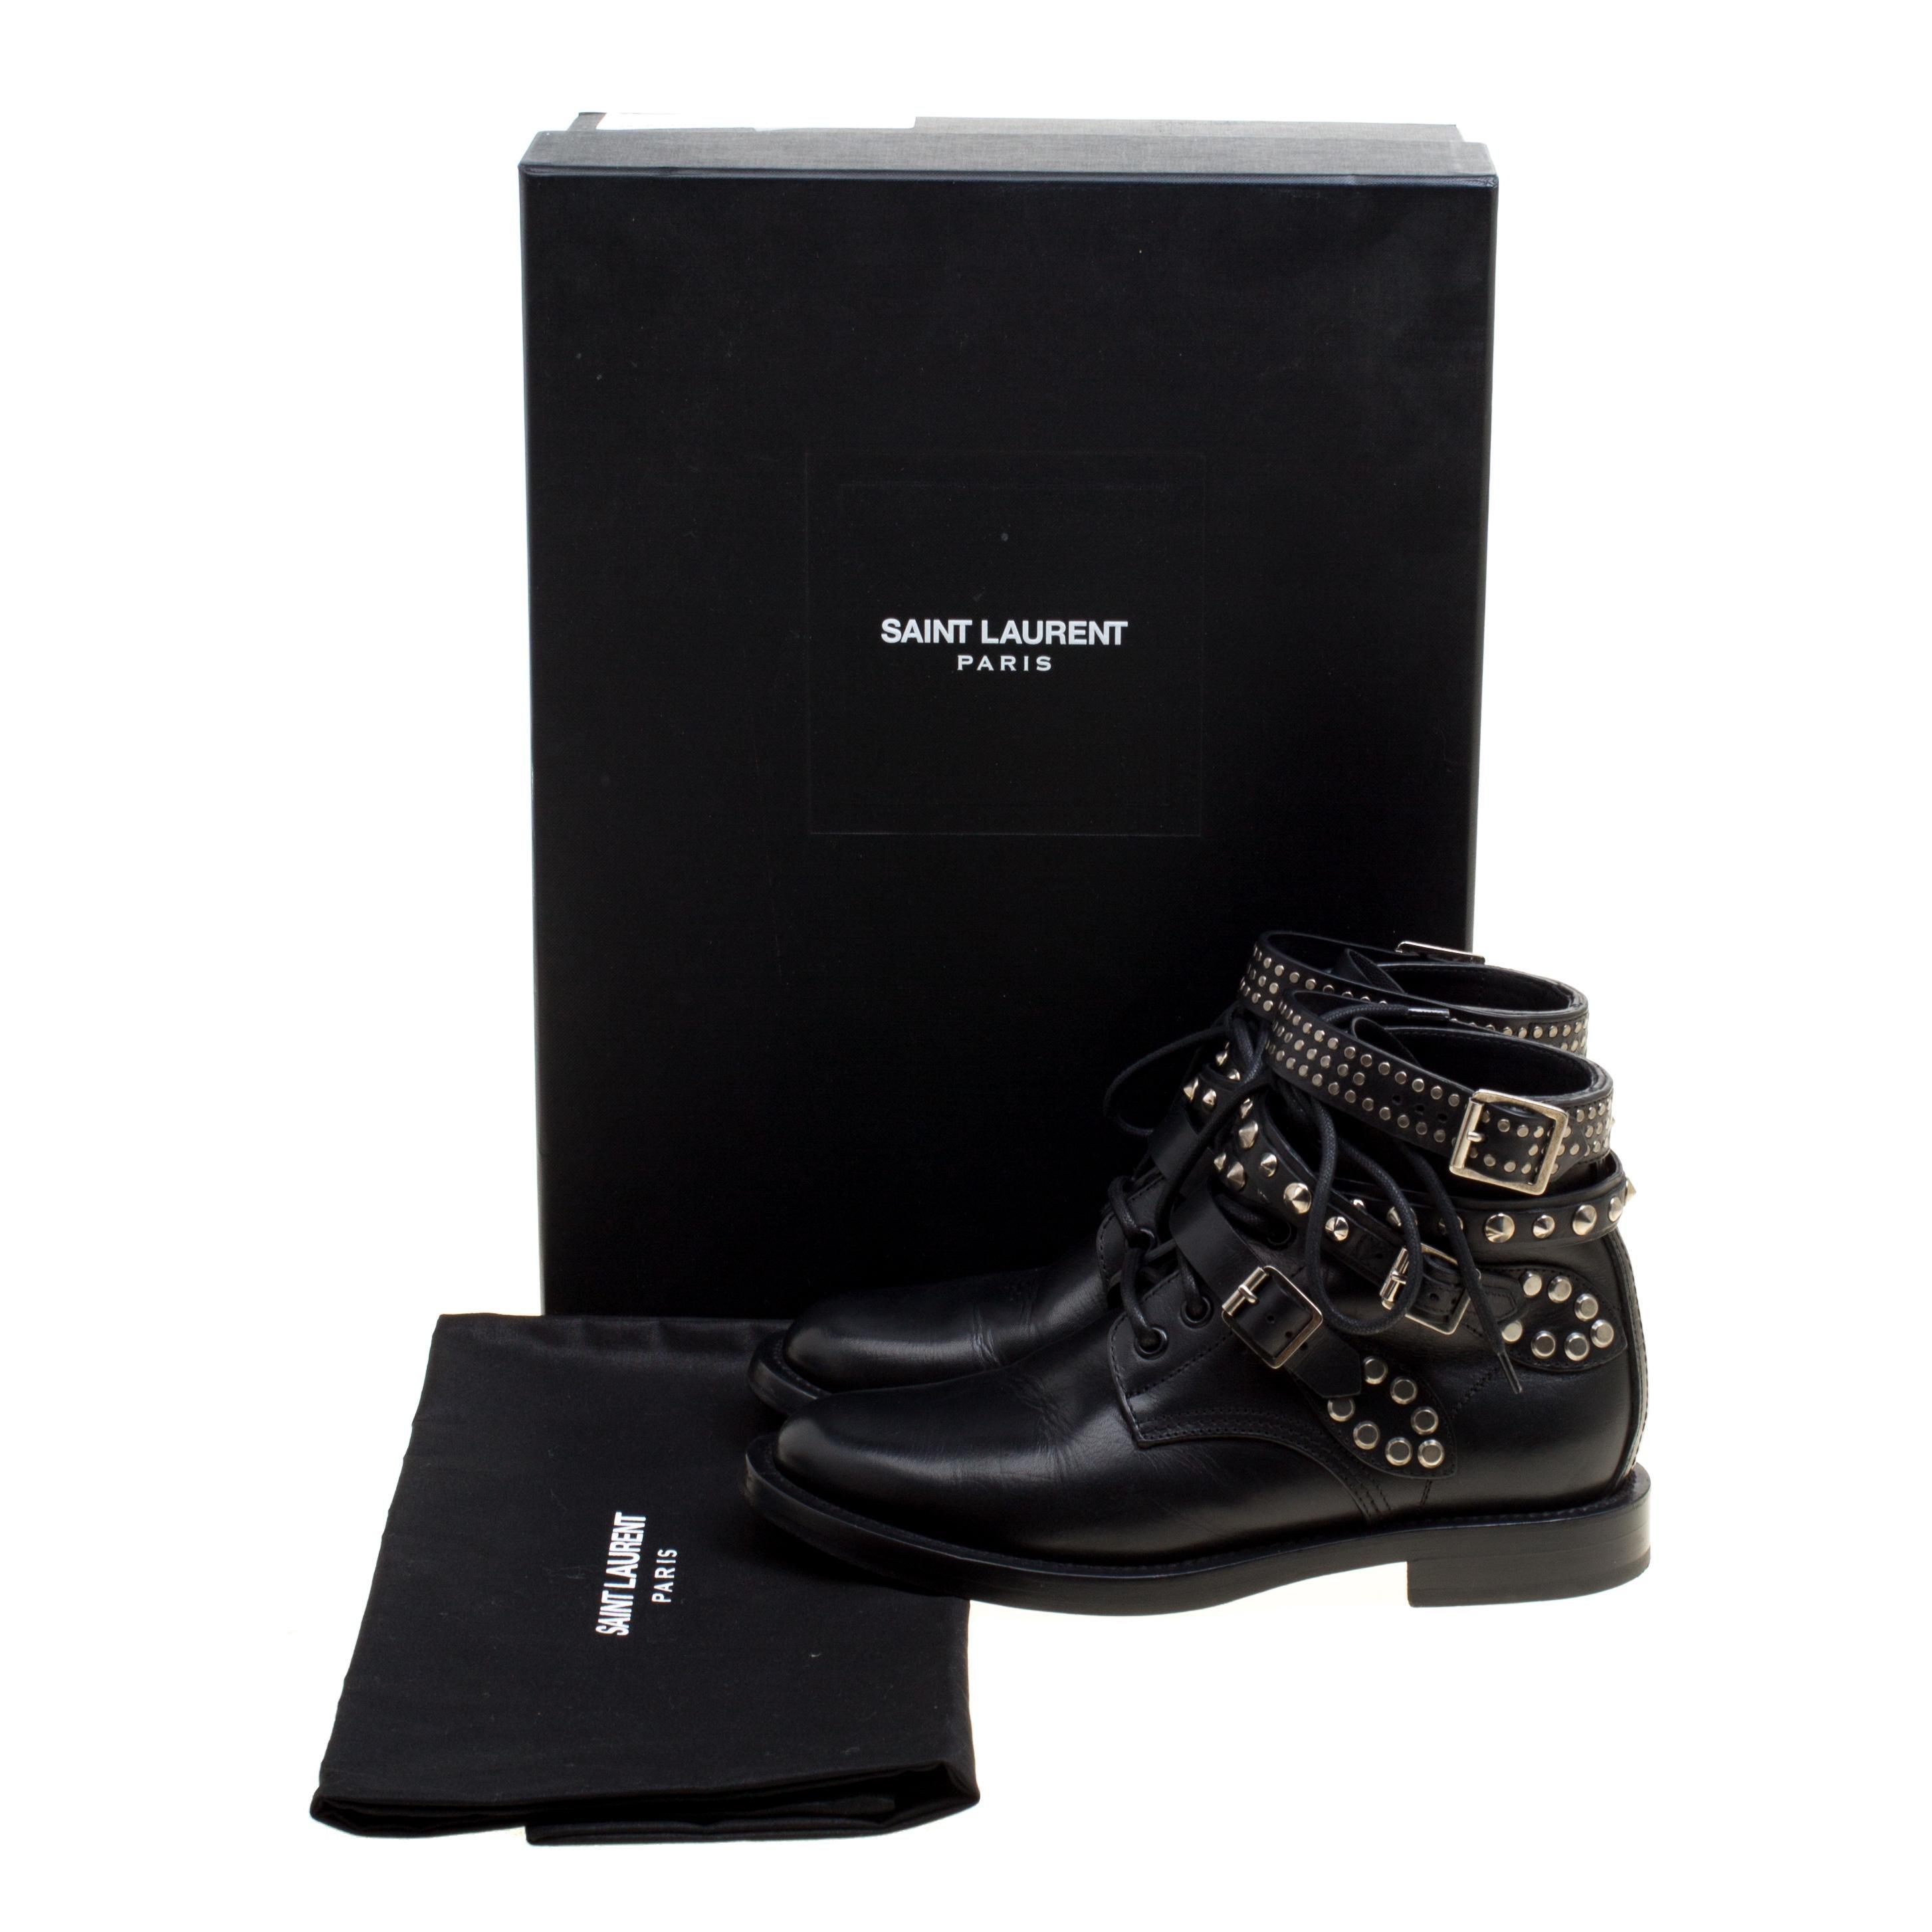 7f8f8331b1d Saint Laurent Paris Black Leather Studded Rangers Ankle Boots Size 36.5 For  Sale at 1stdibs